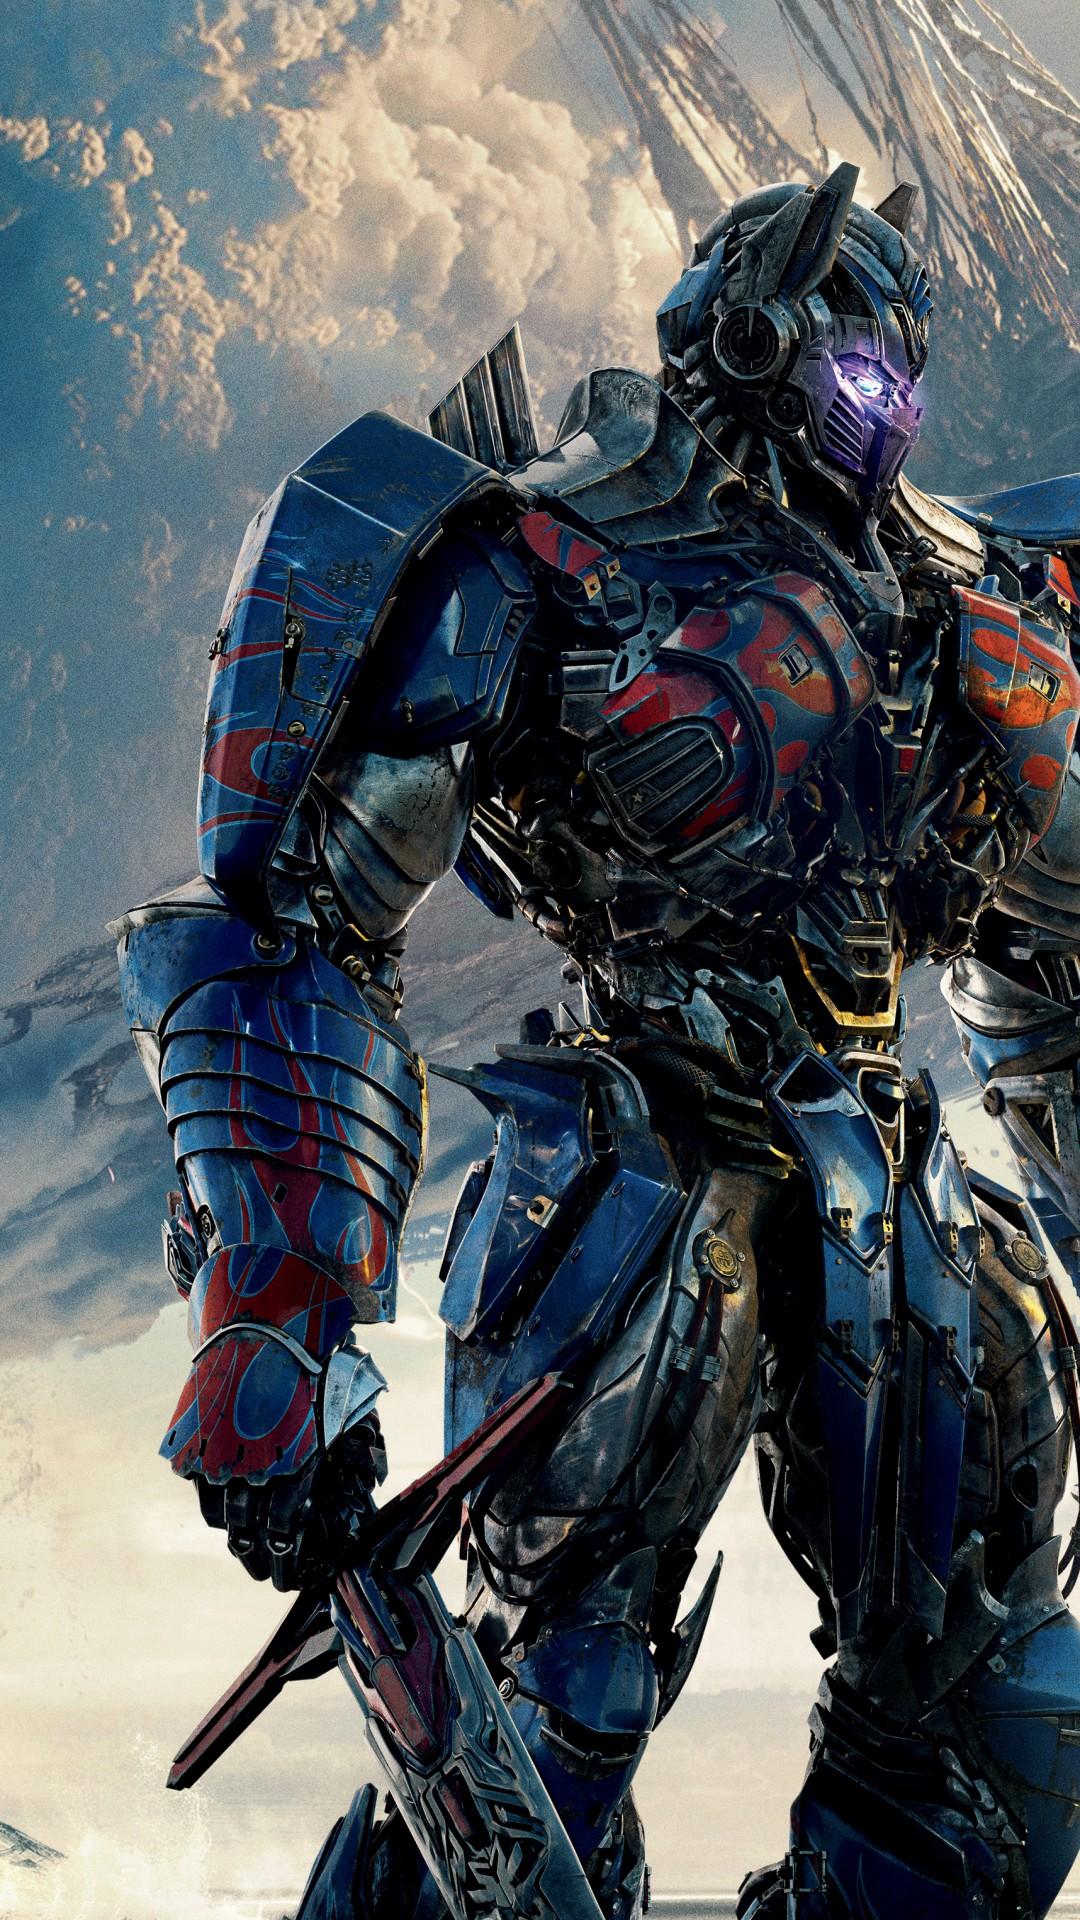 Wallpaper Transformers: The Last Knight, Transformers 5